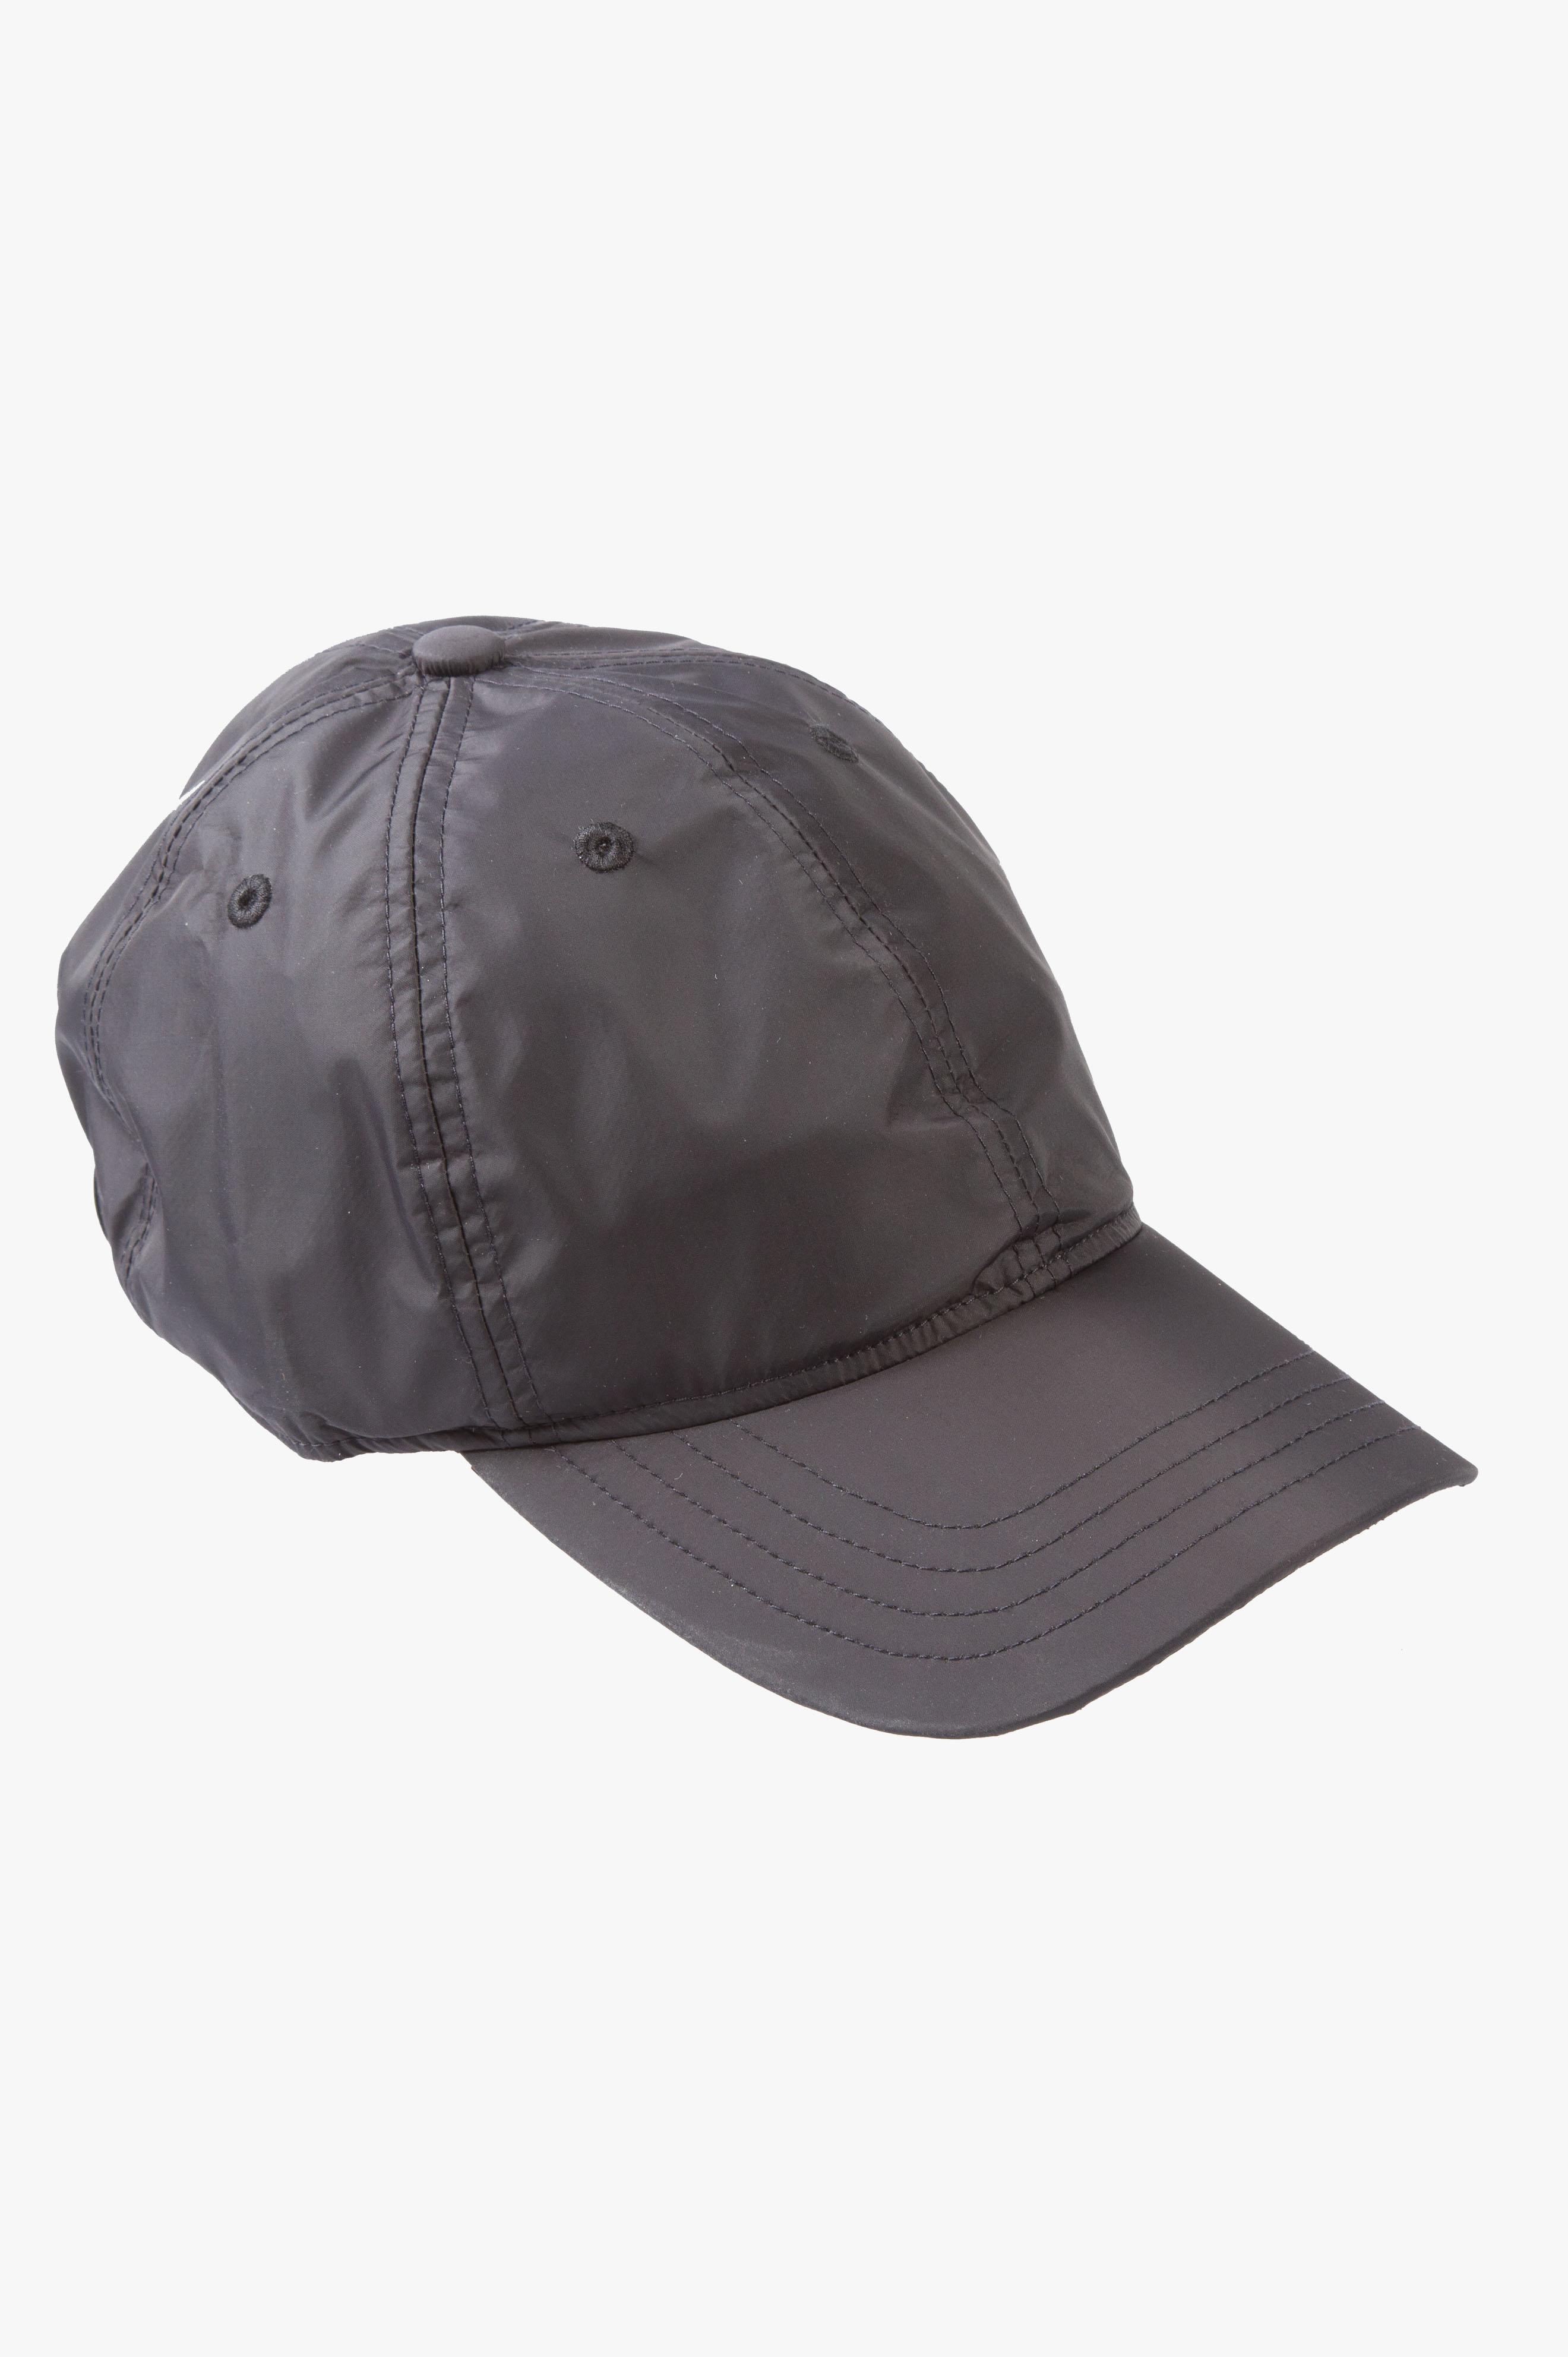 Ballcap Black